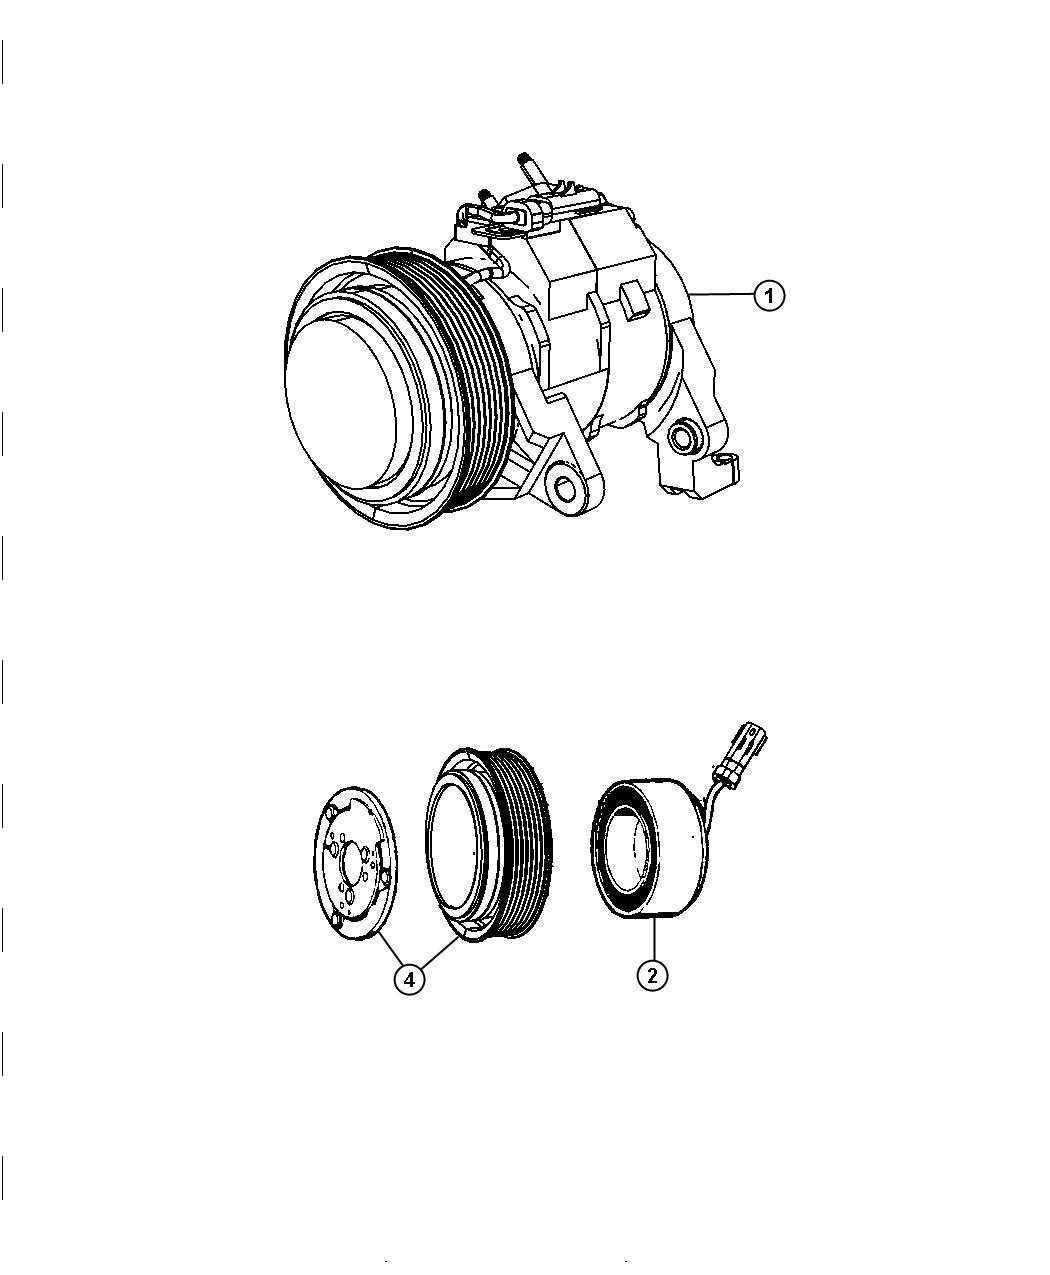 Dodge Ram Compressor Air Conditioning Vehicles